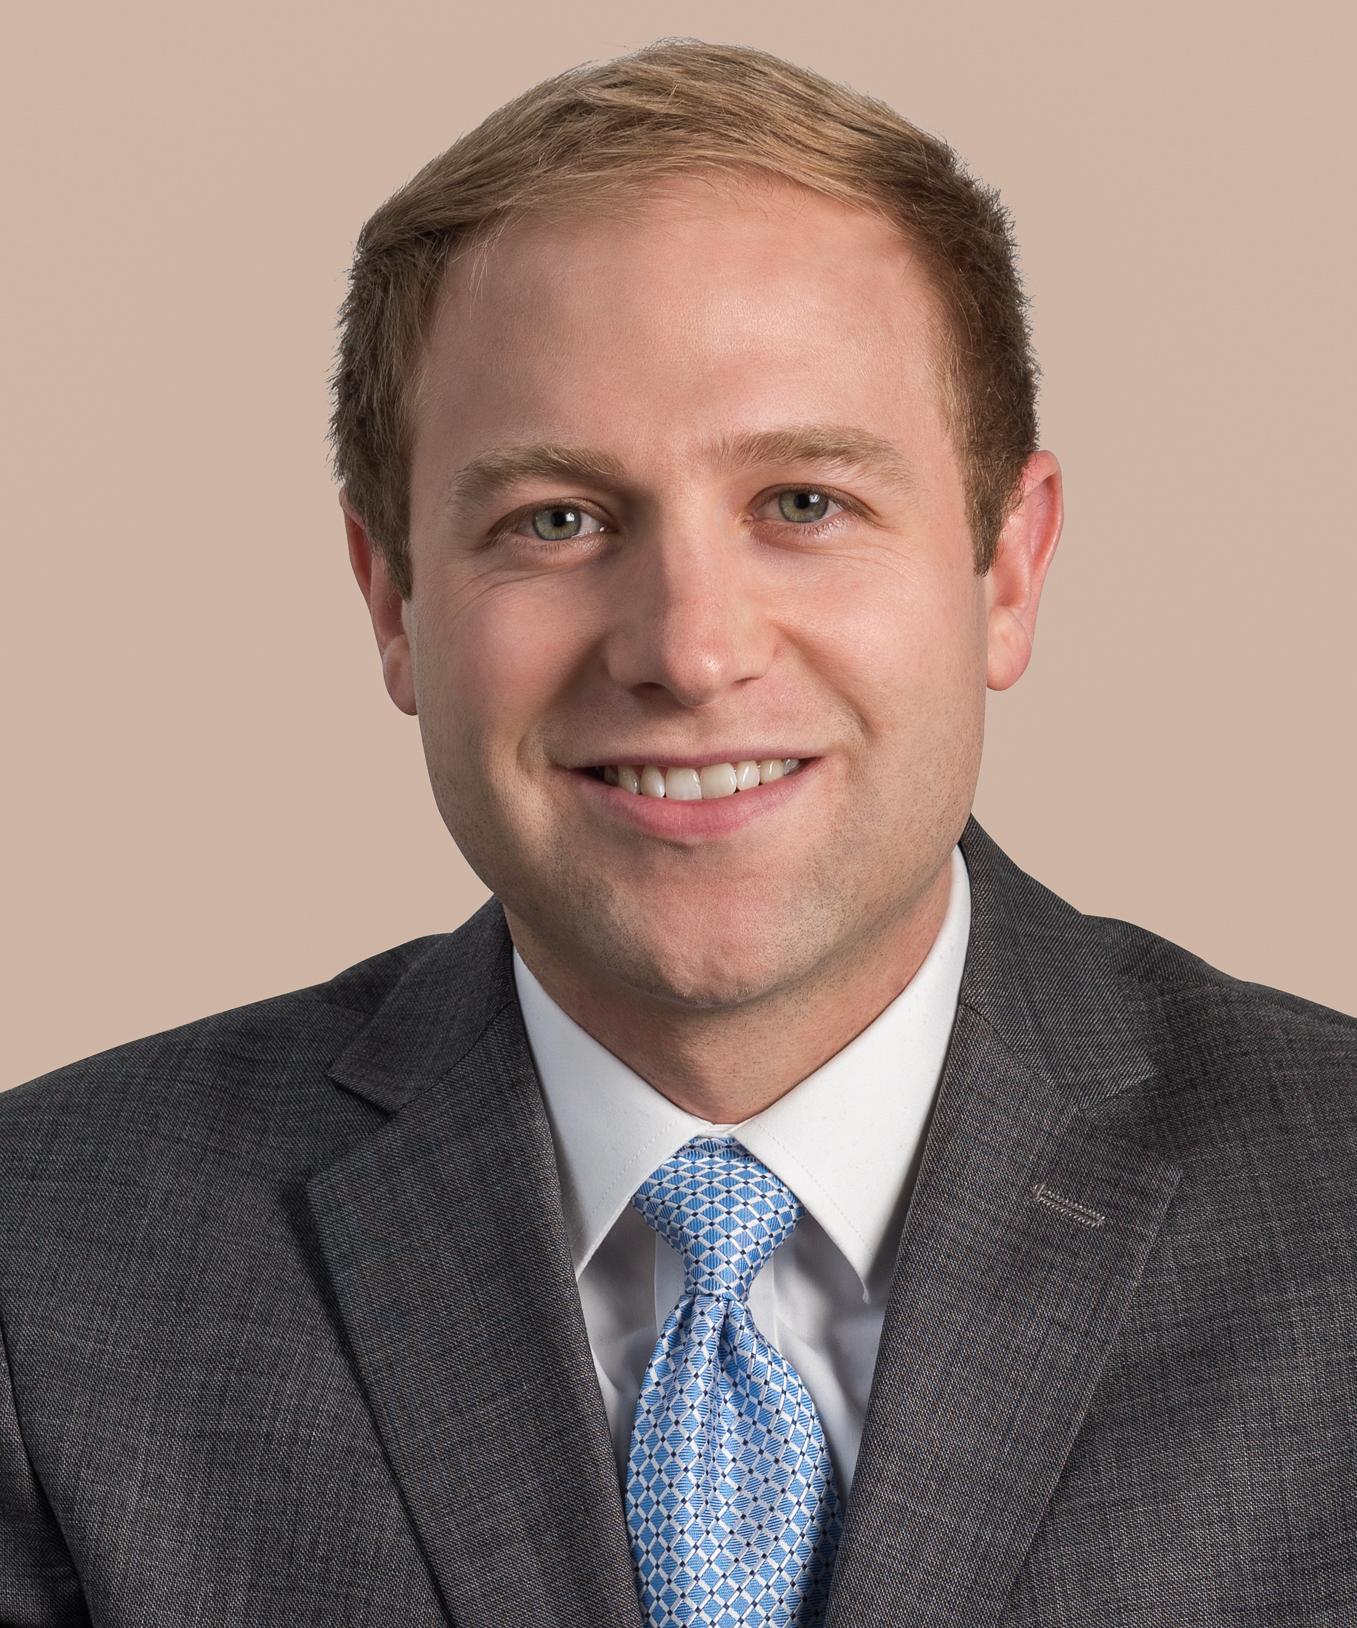 Ryan Tomko, CFP